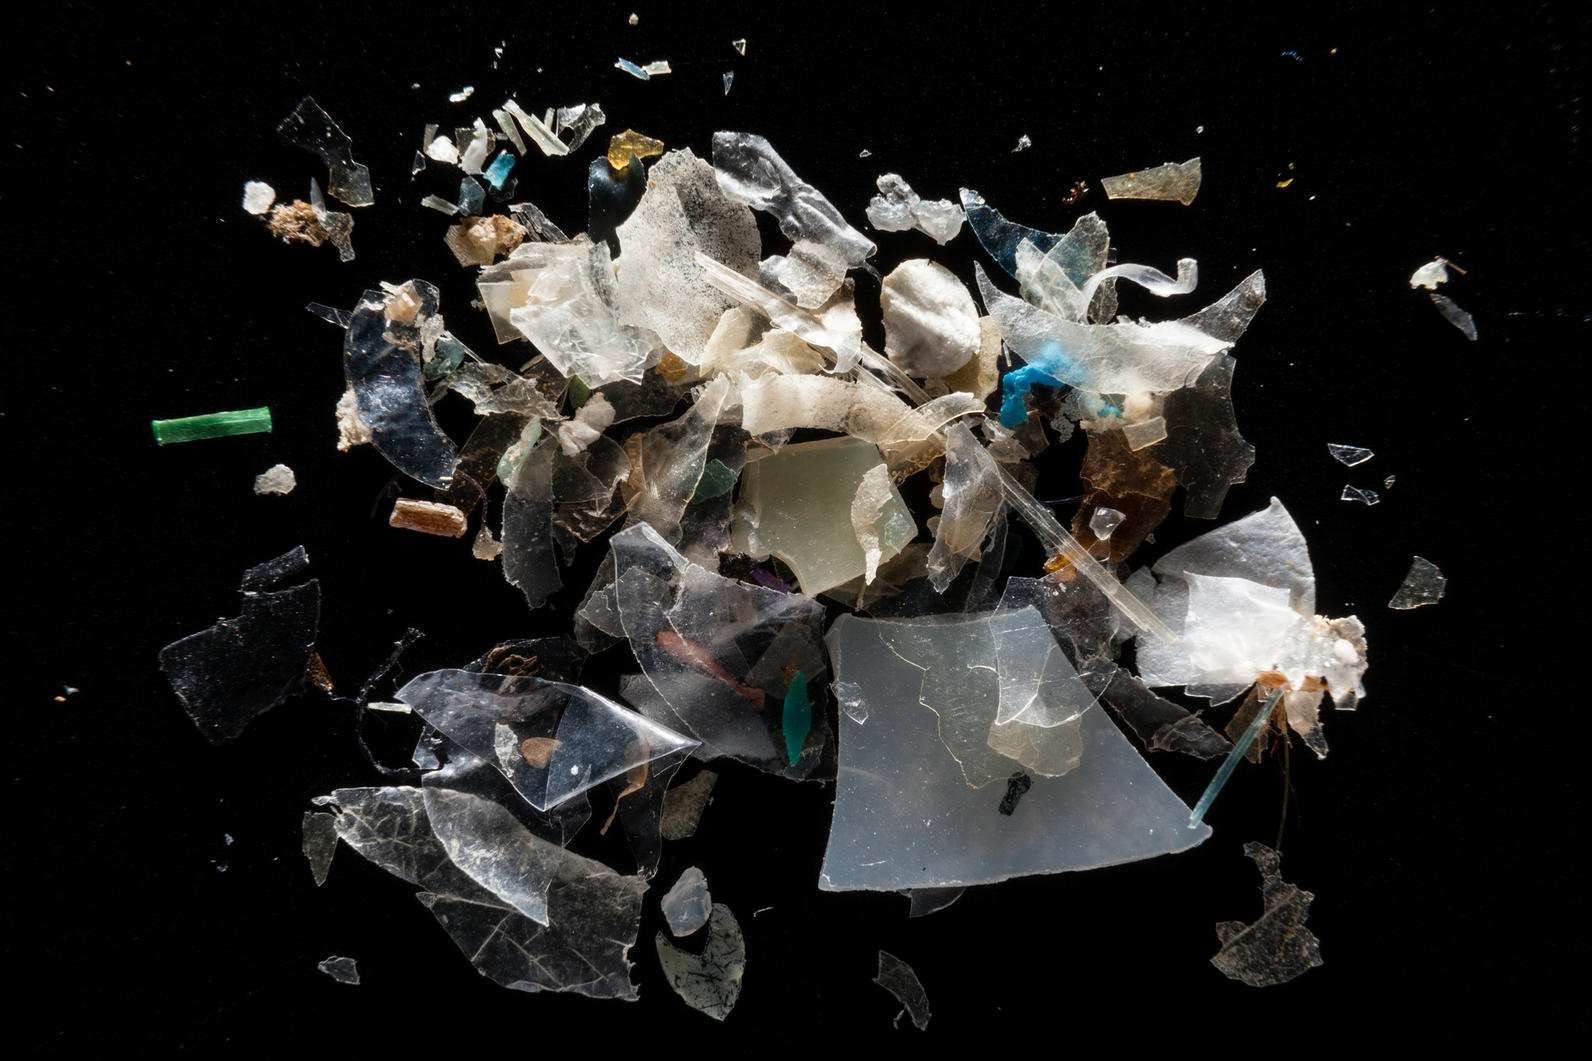 Microplastics in the Chesapeake Bay Watershed